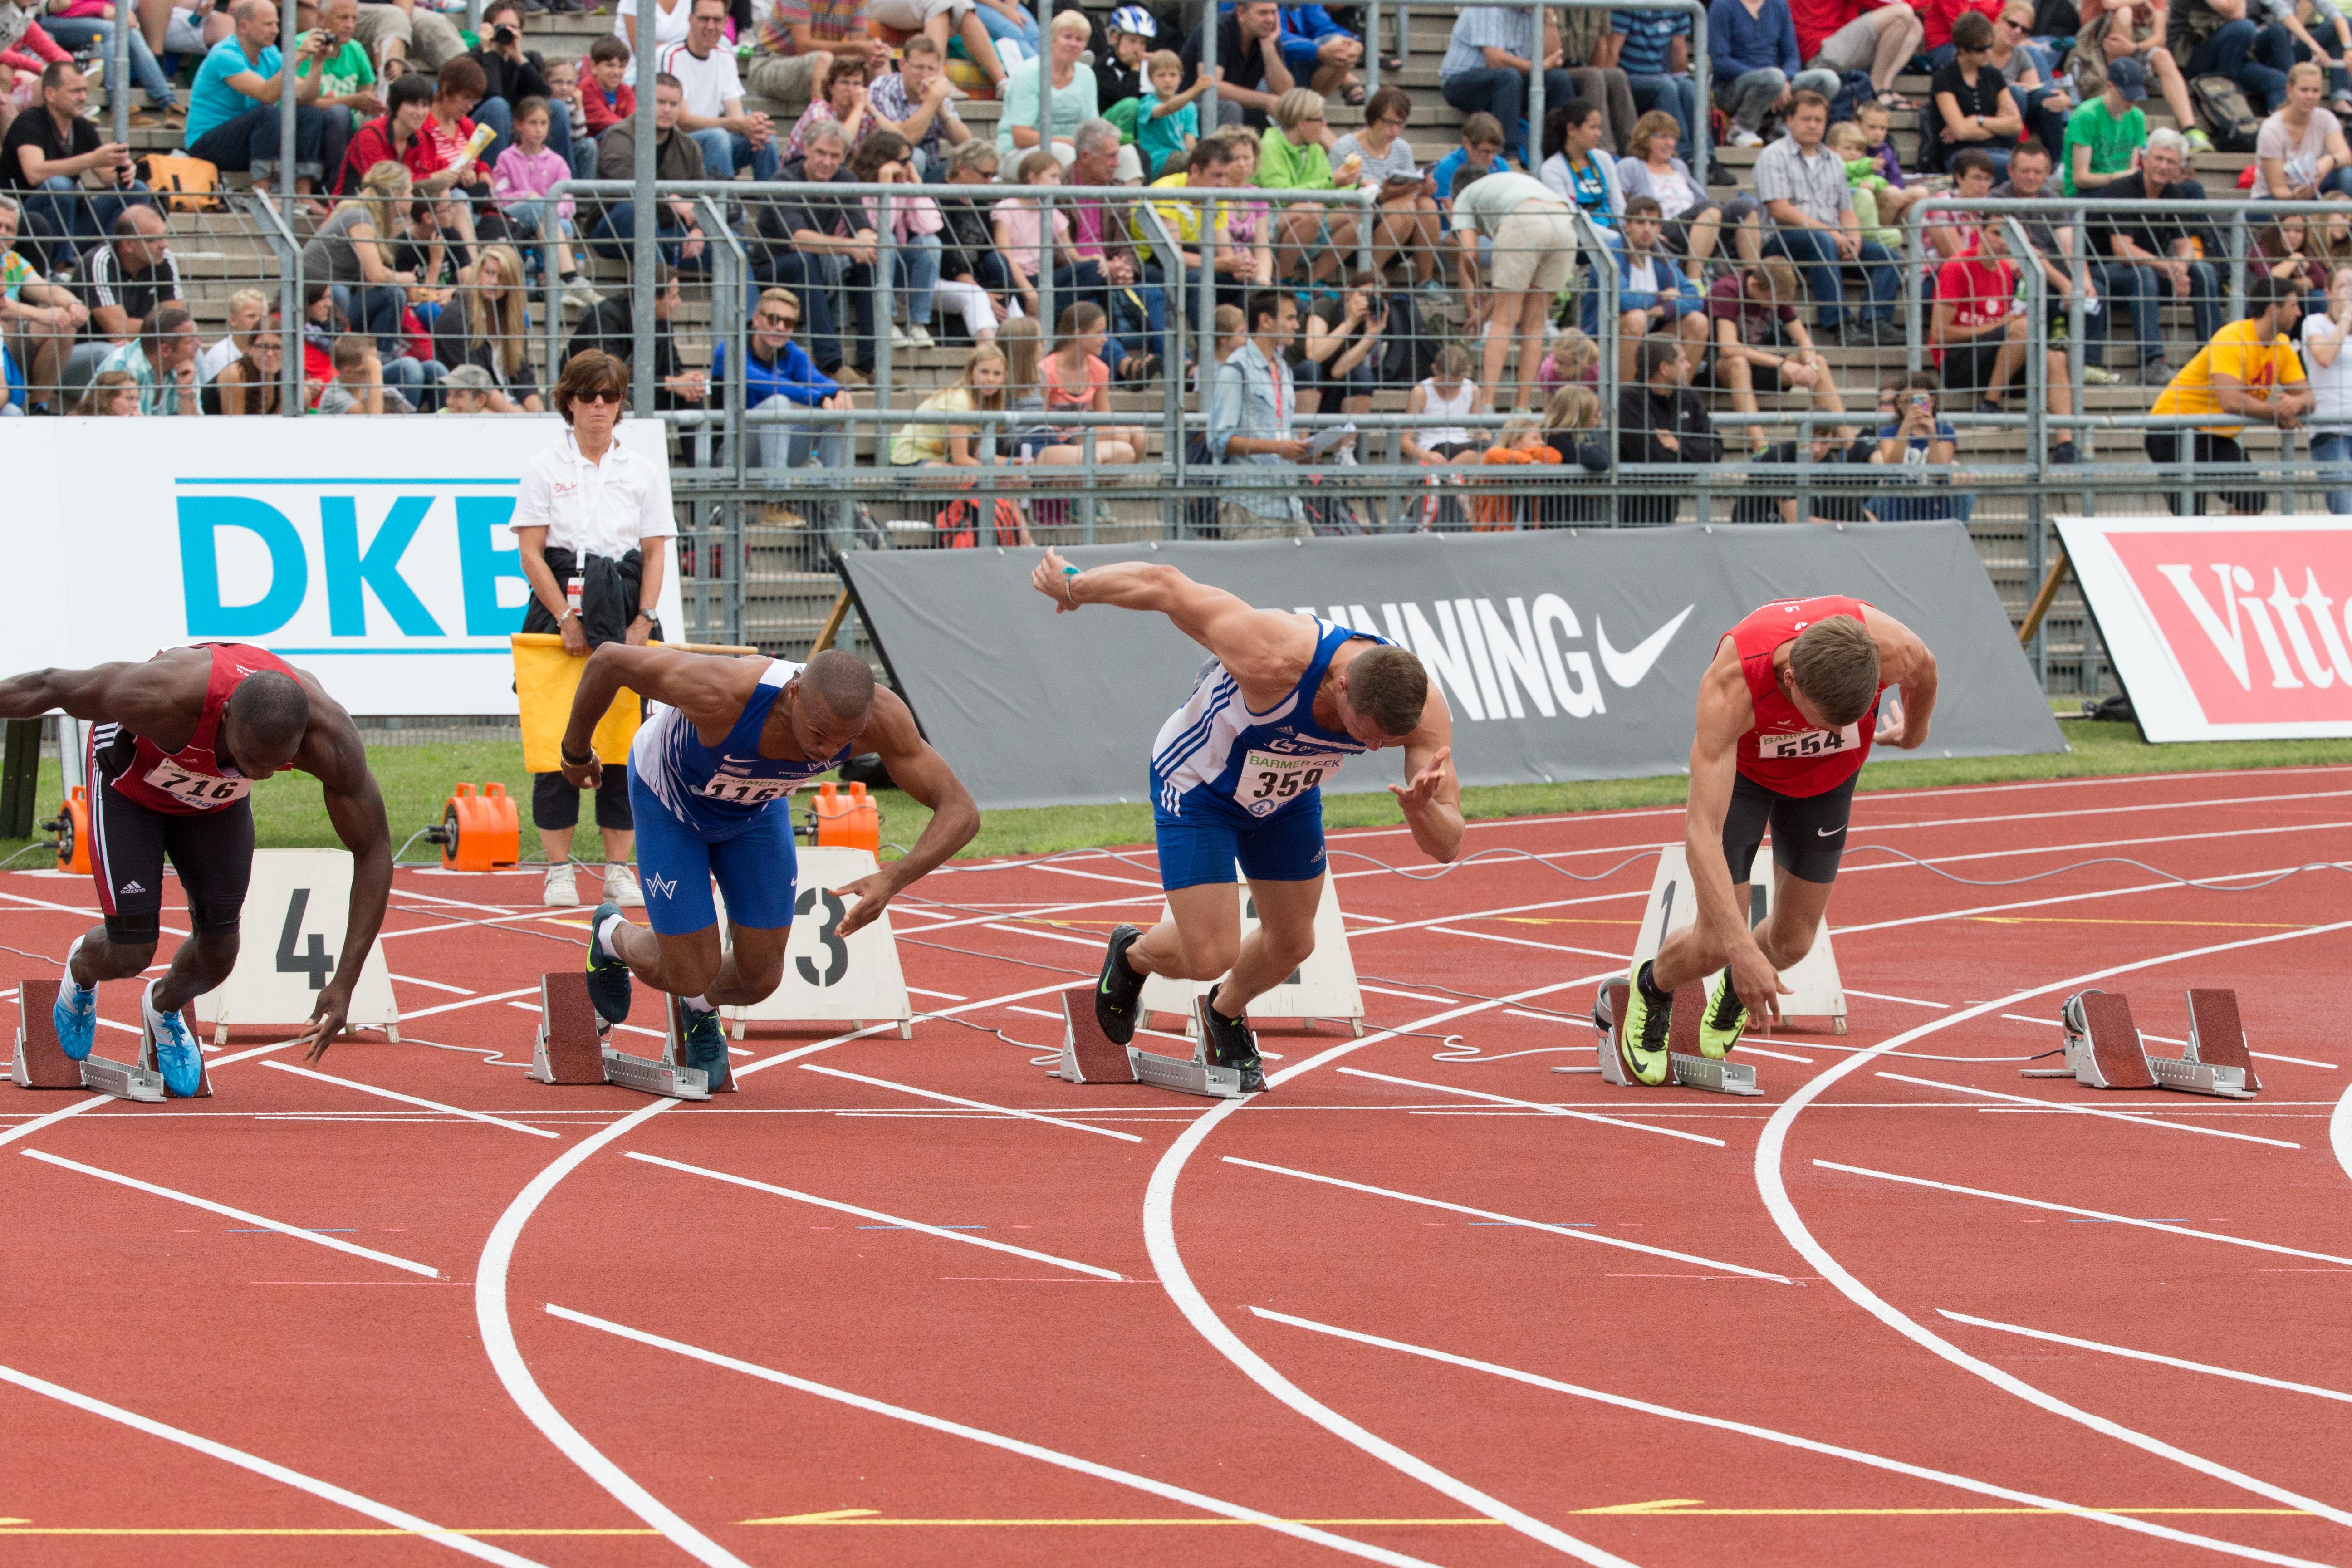 Leichtathletik 100m